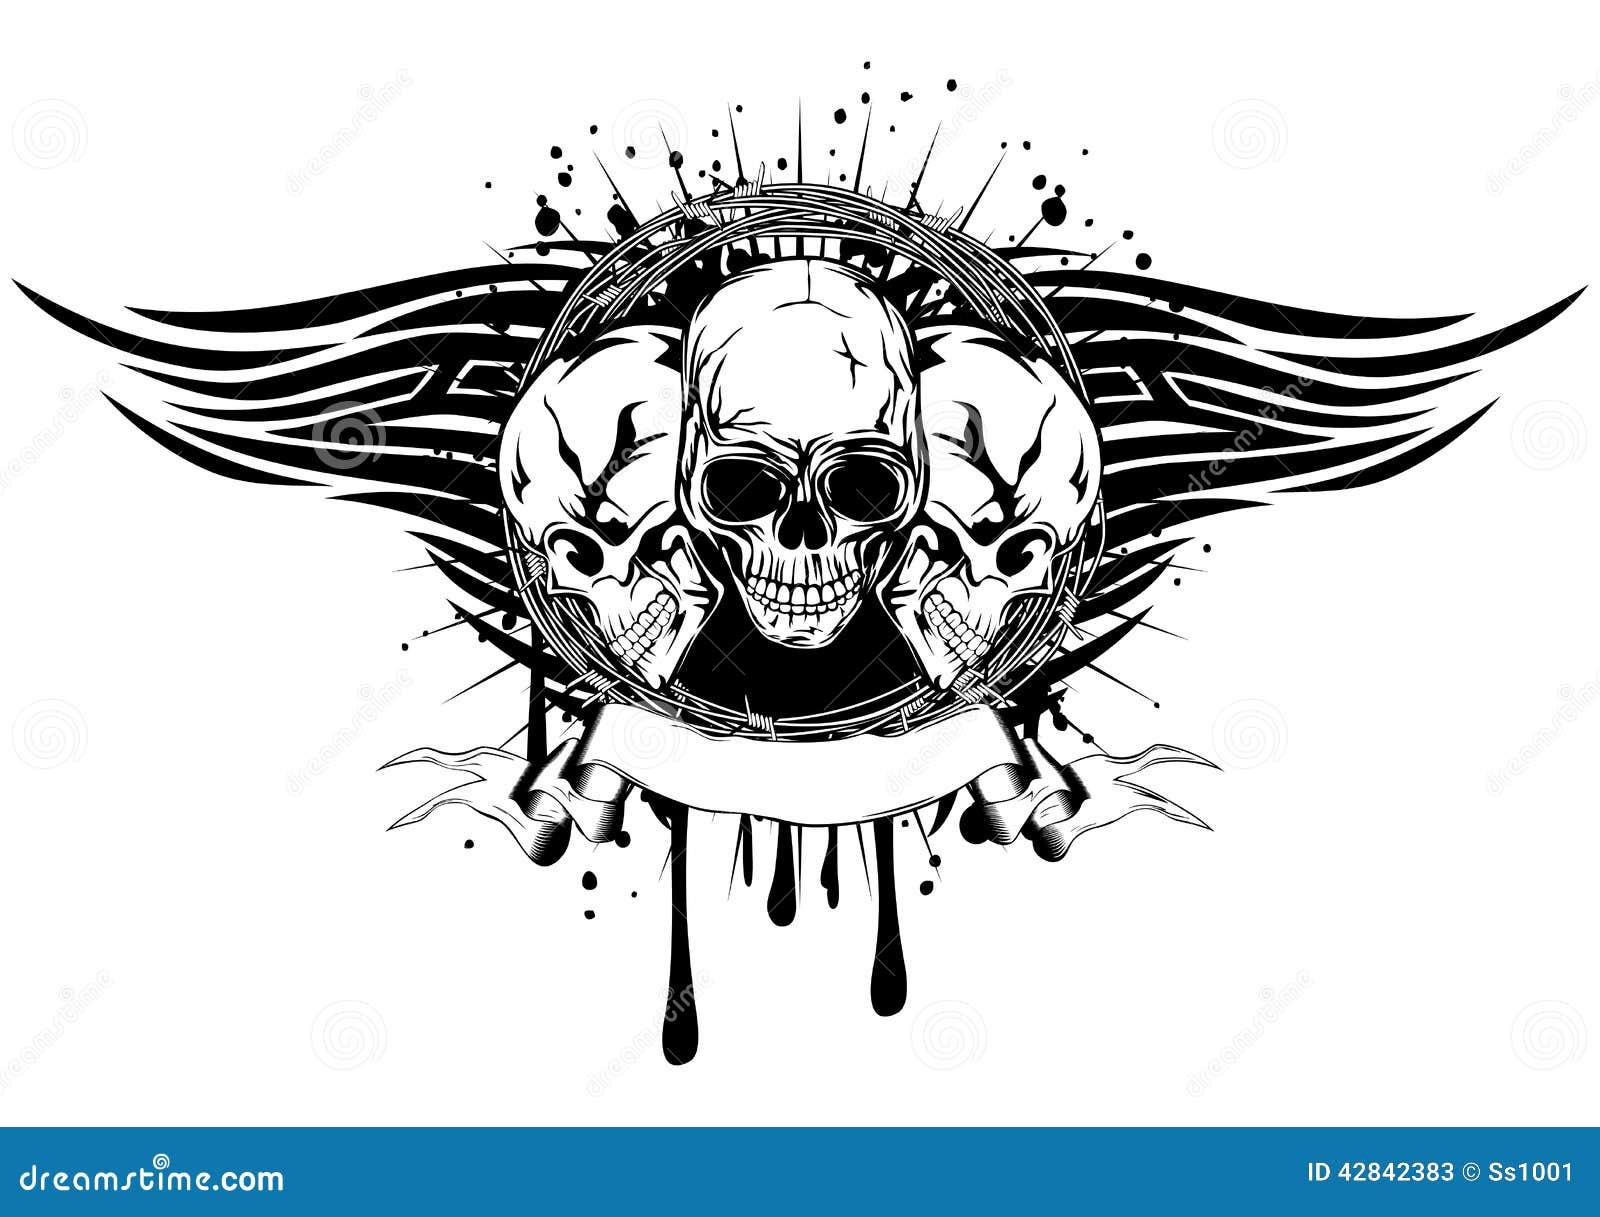 Tribal Death Tattoo: Three Skulls Tribal Stock Vector. Illustration Of Cranium